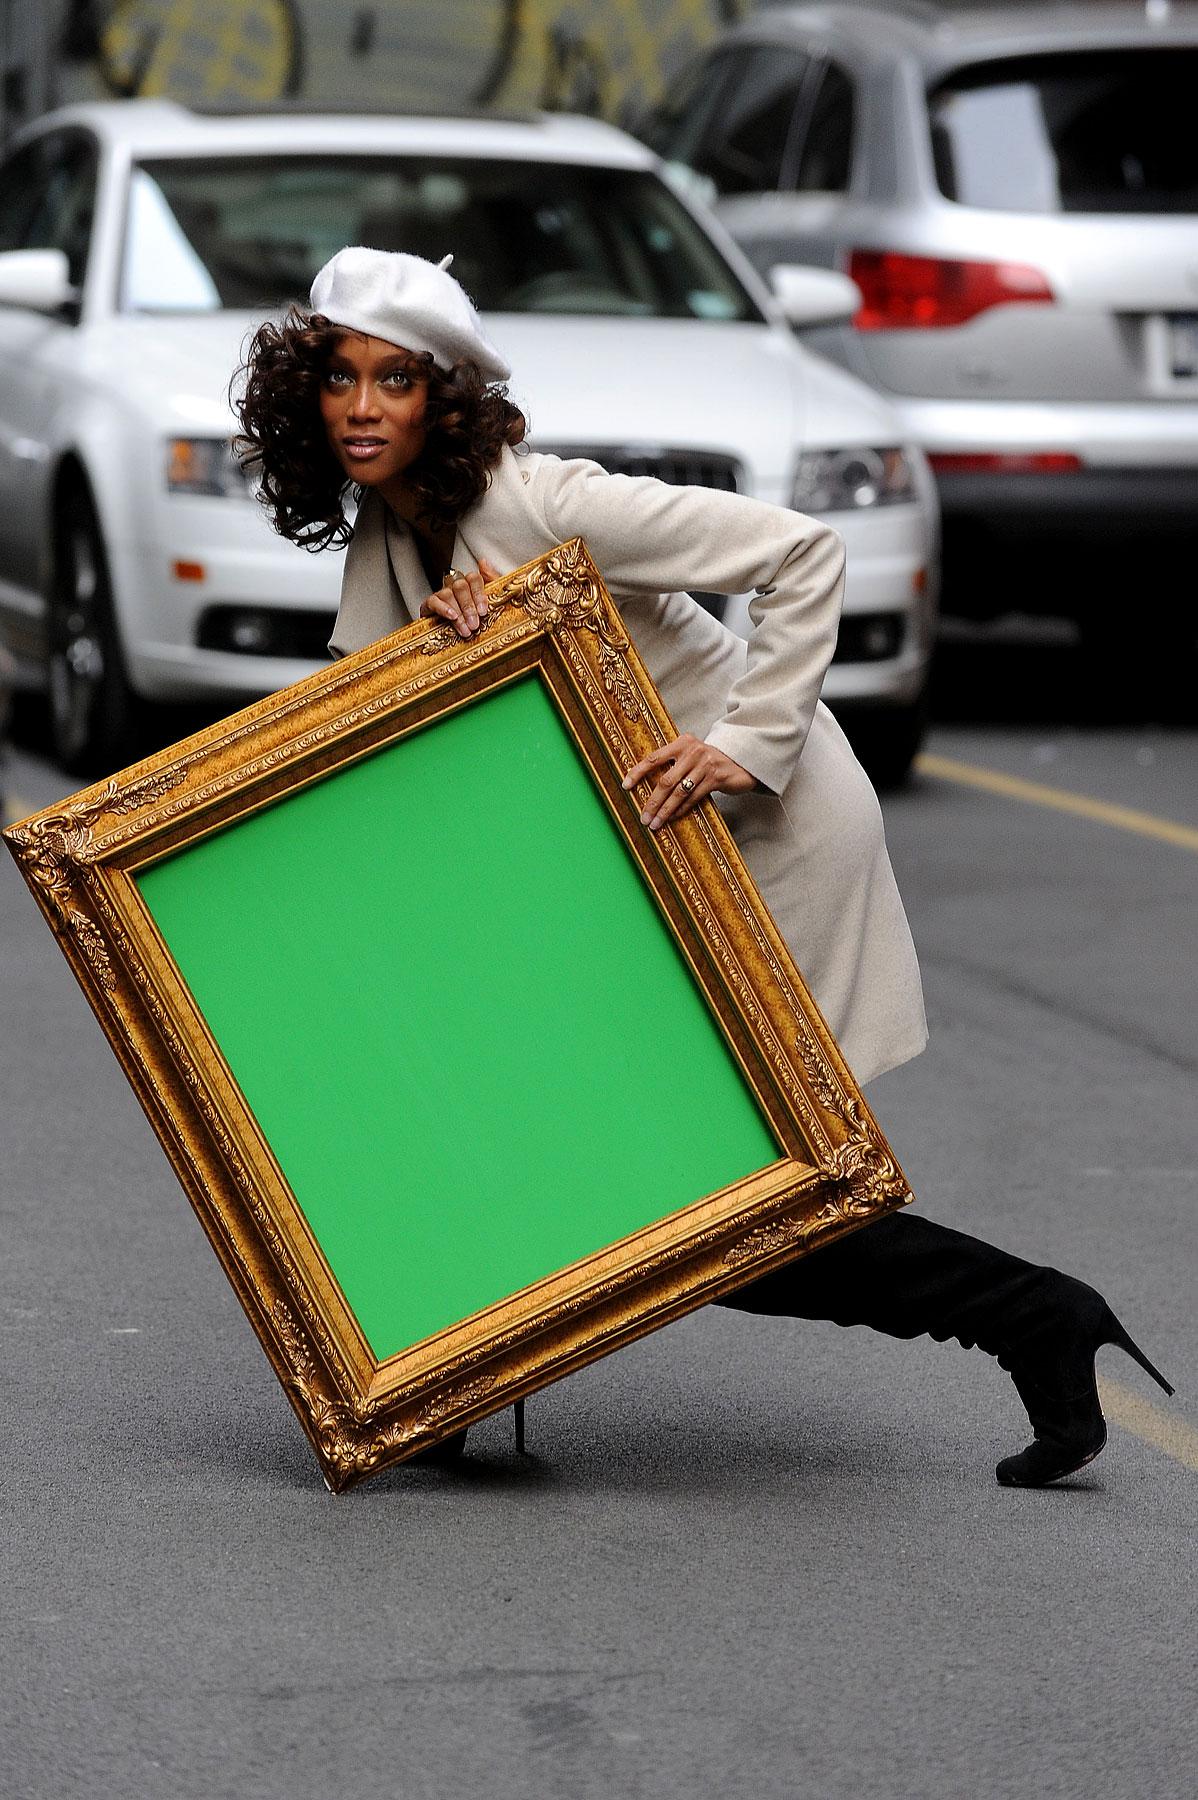 PHOTO GALLERY: Tyra Banks Photo Shoot